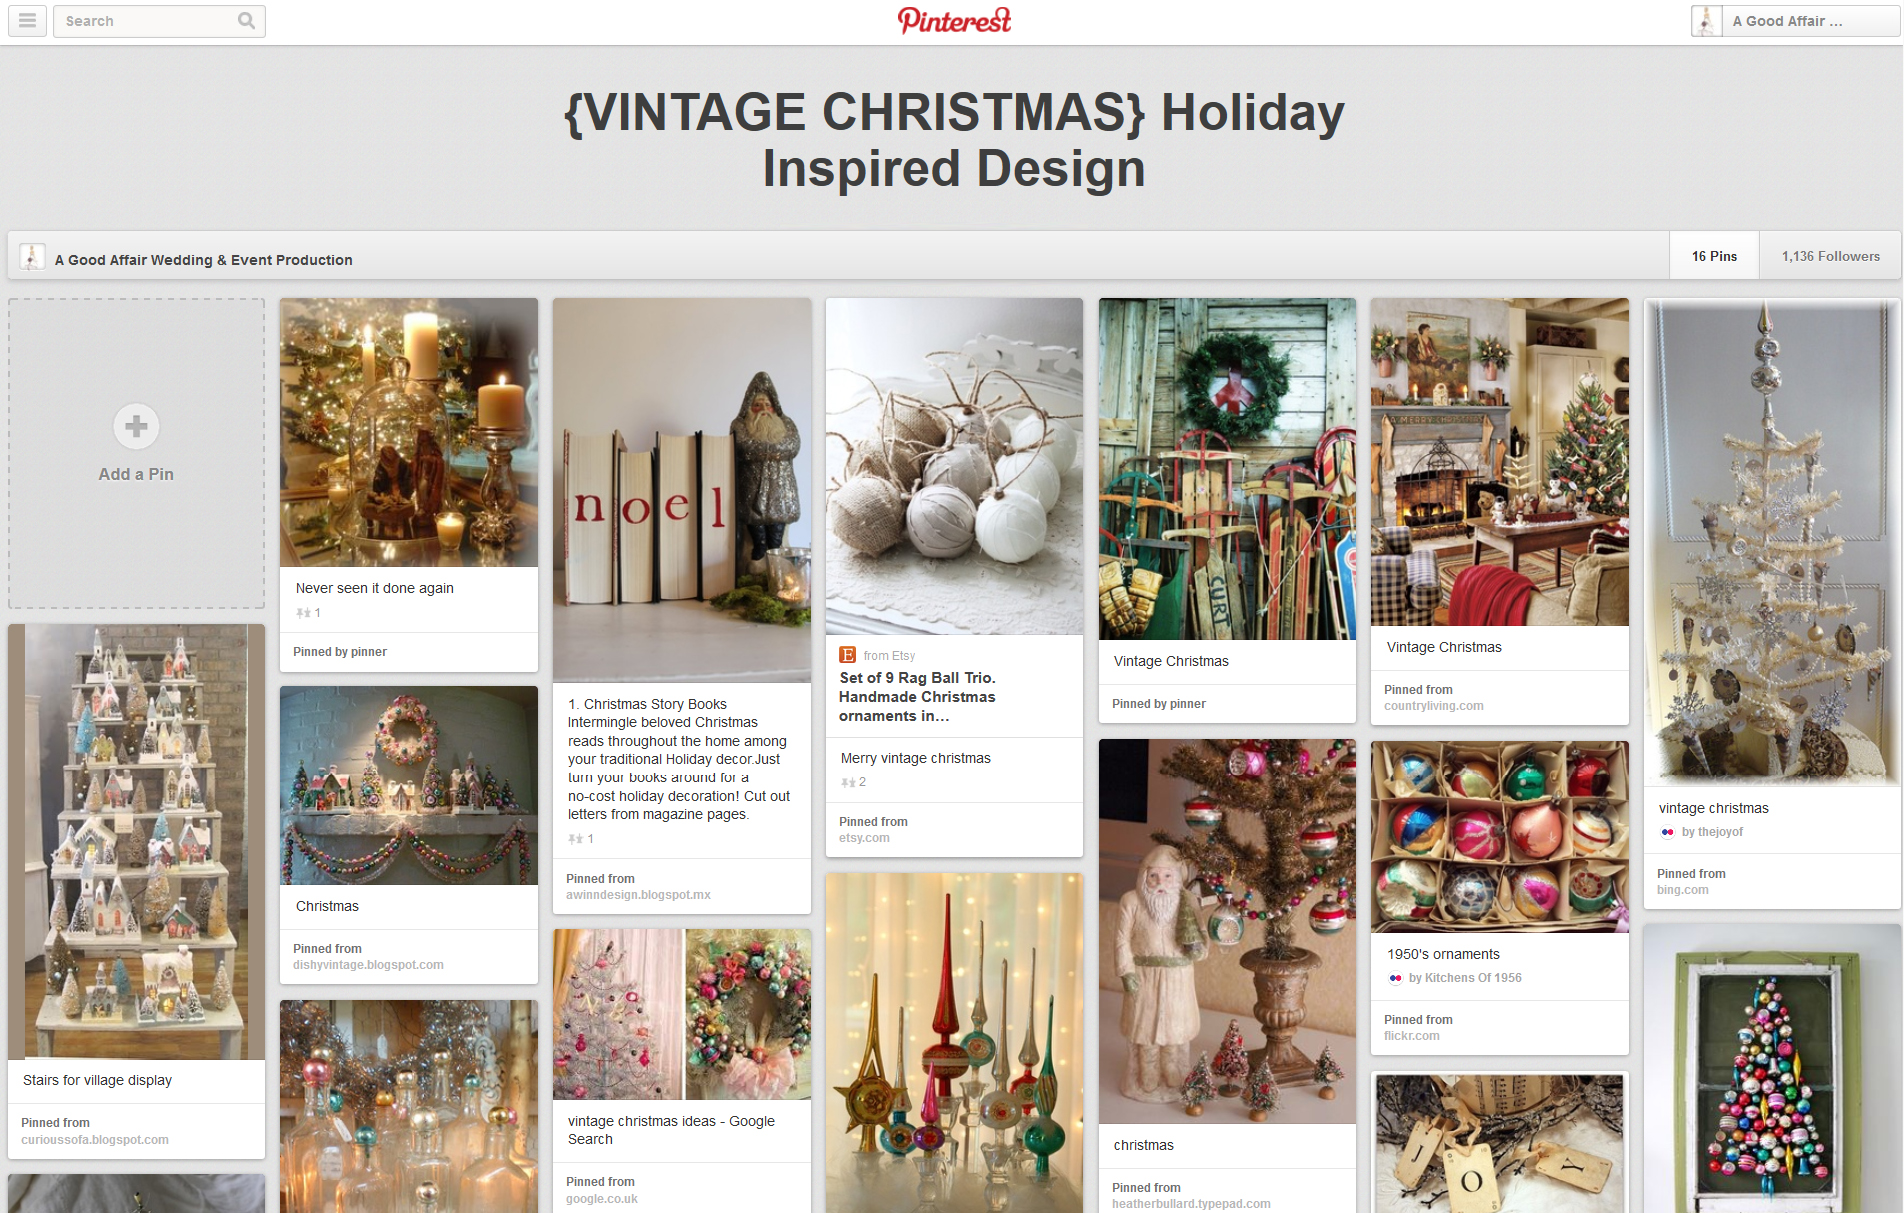 holidayinspo_vintage